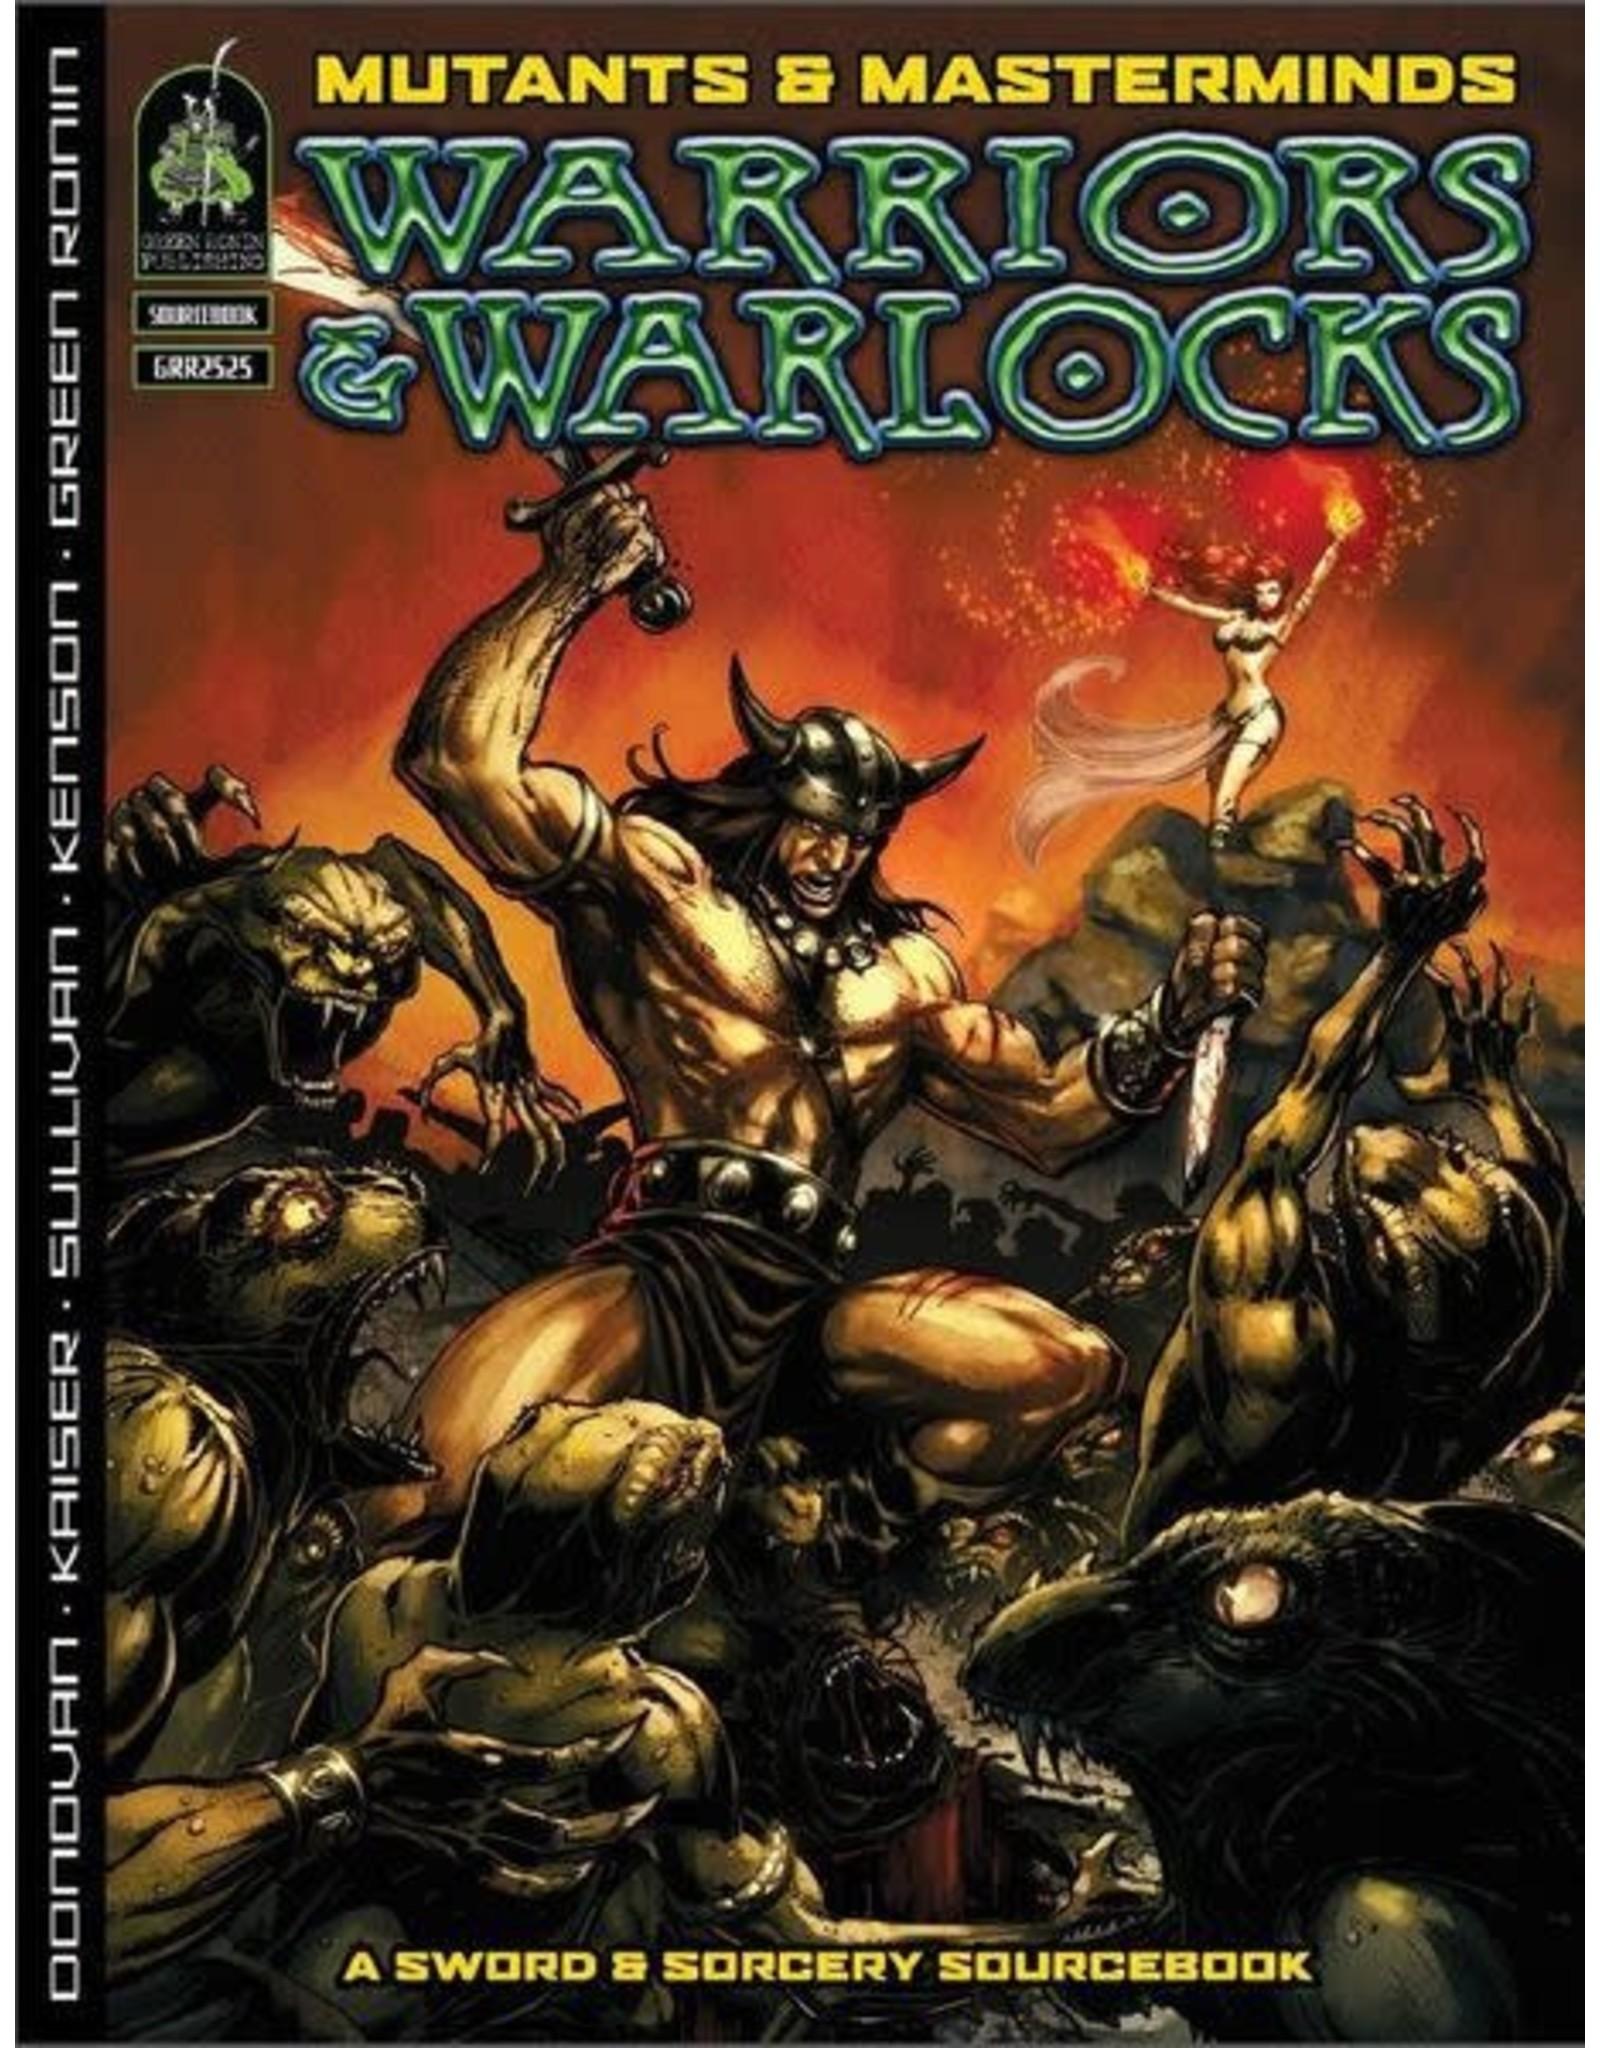 Green Ronin Publishing SALE - Mutants & Masterminds 2E: Warriors & Warlocks